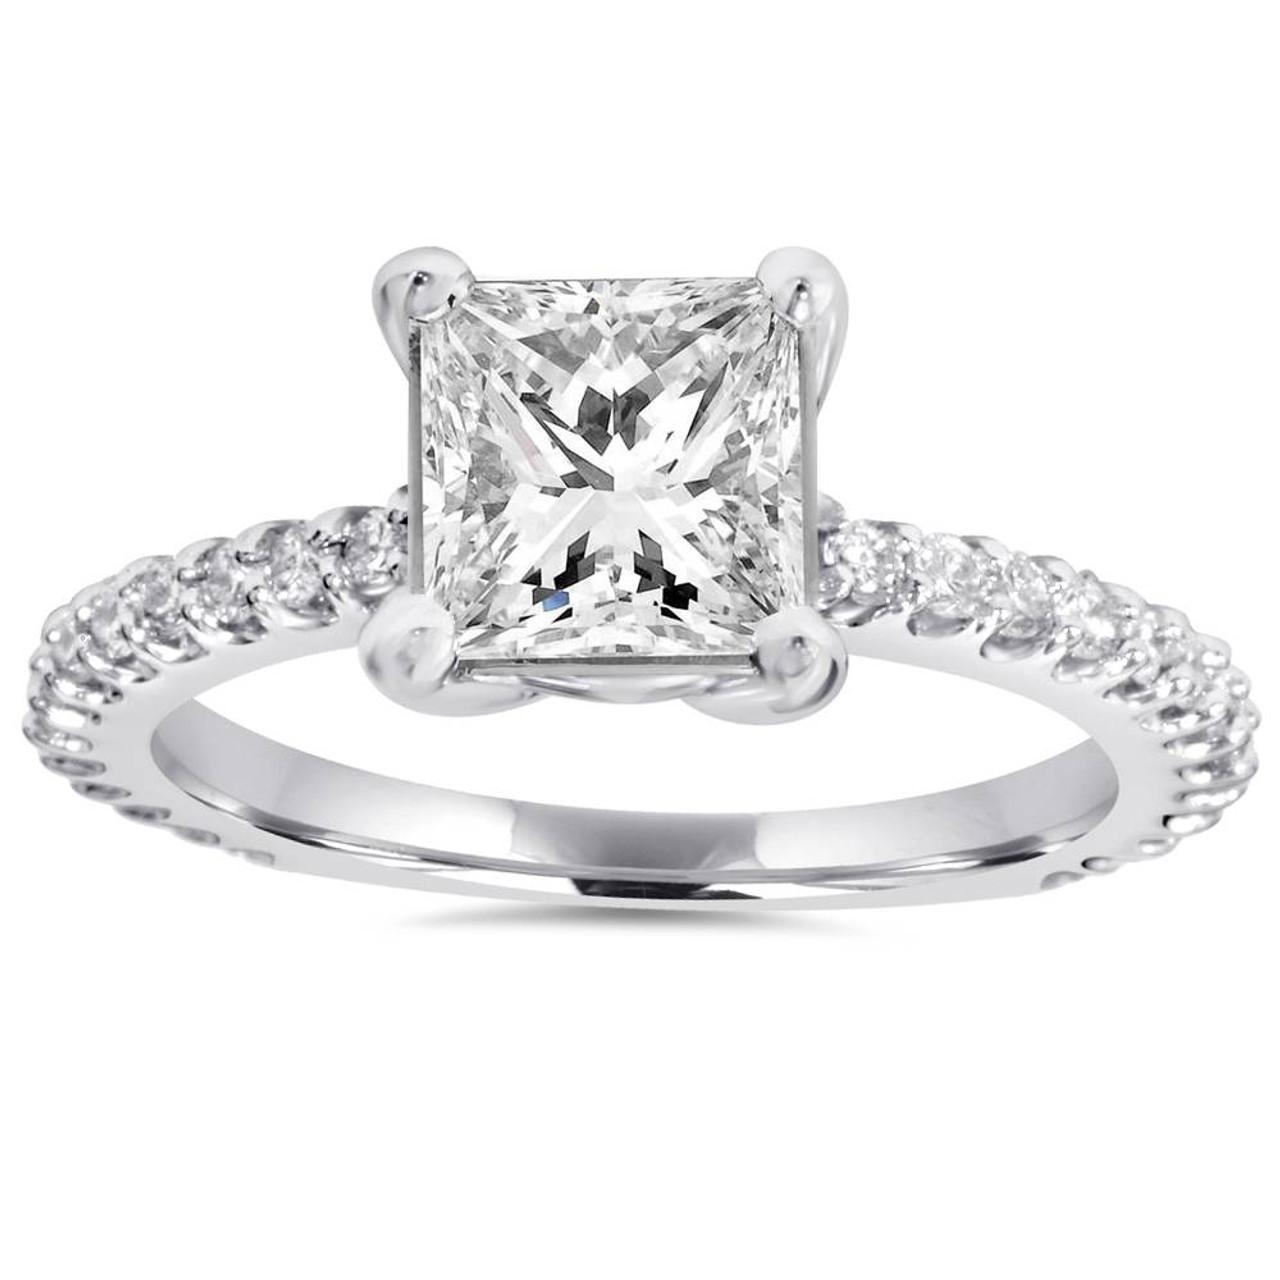 Princess Cut Diamond 1 1 3 Ct Engagement Ring 14k White Gold